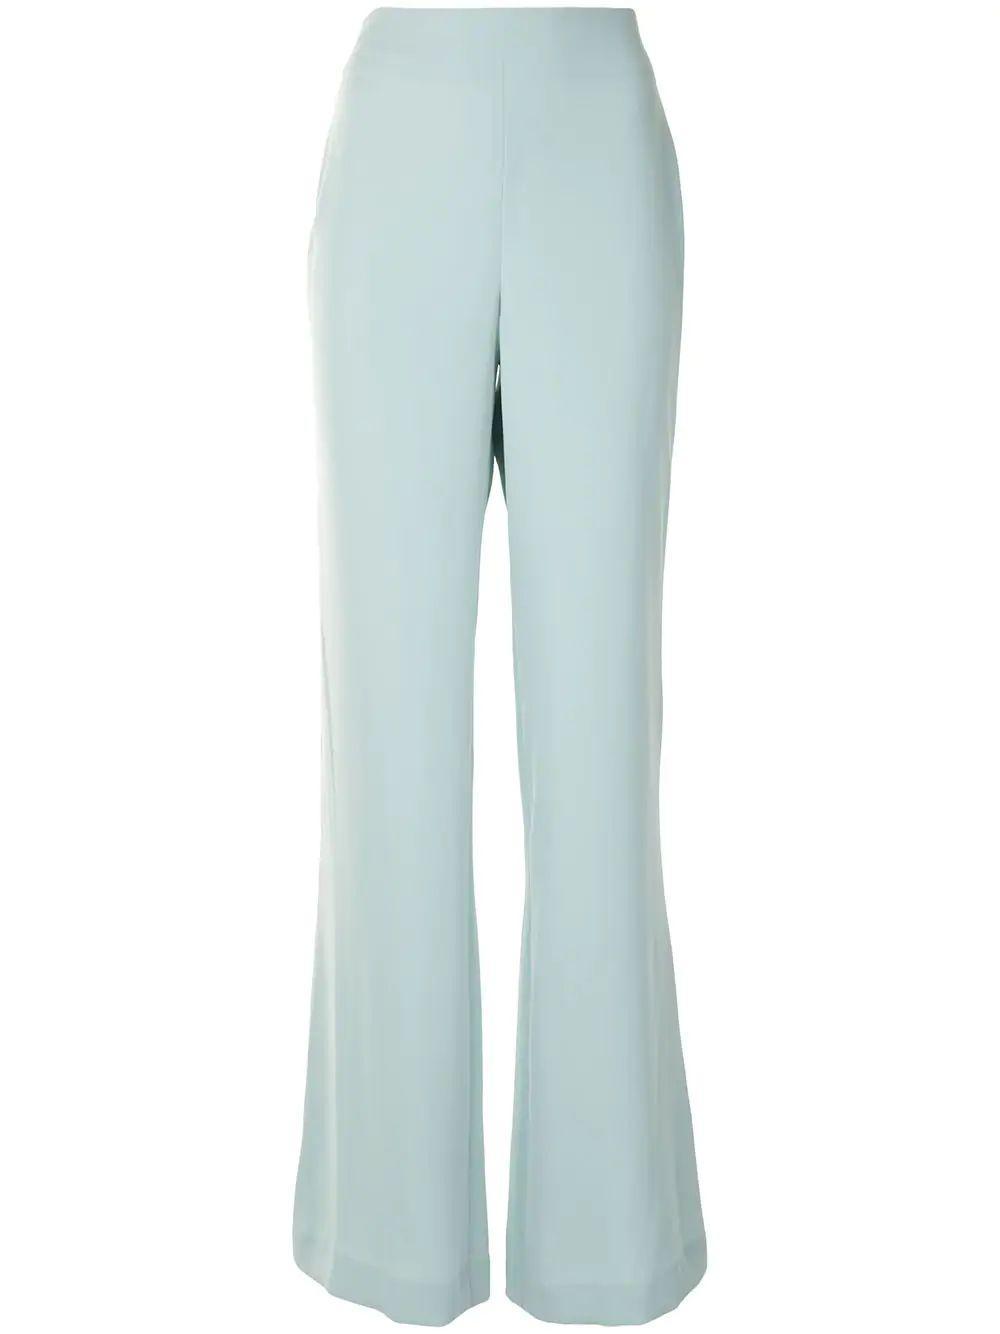 Lucia Wide Leg Evening Pant